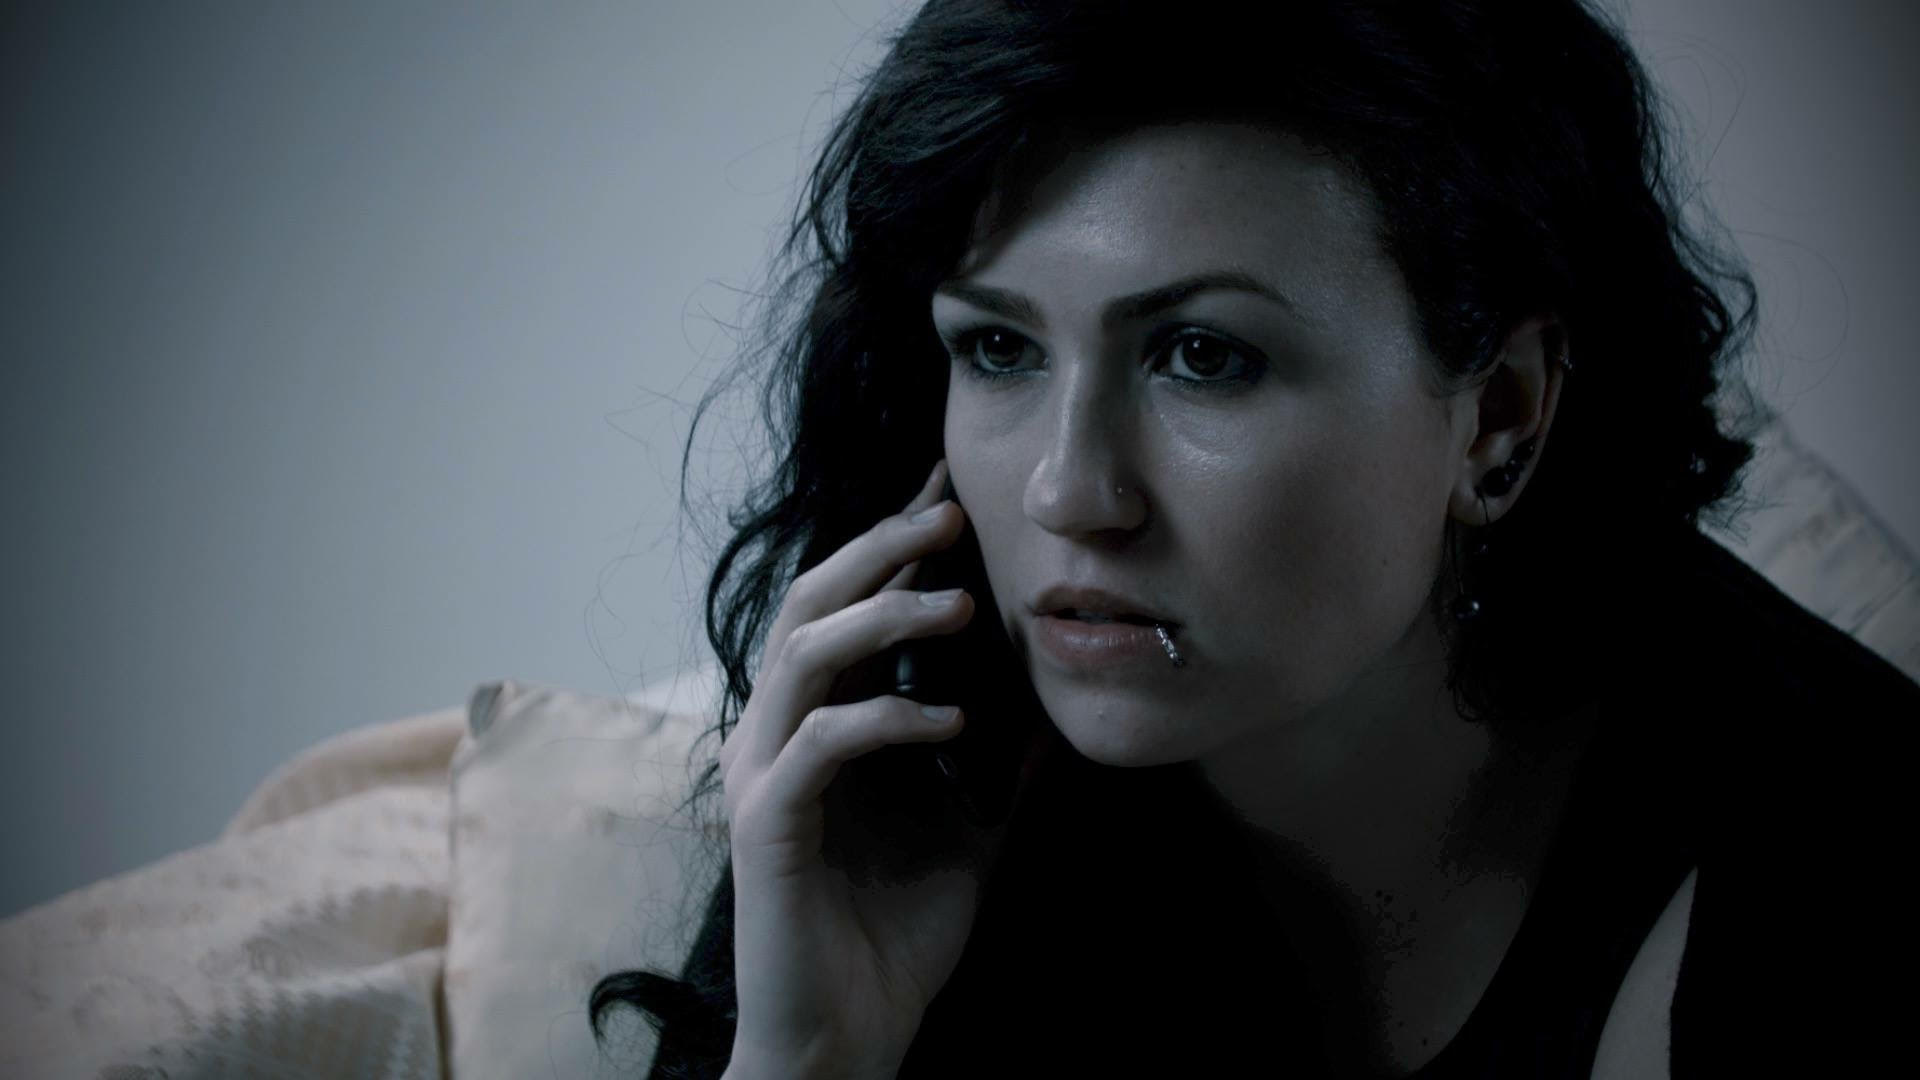 Raffaella short film Bones - City Academt Acting student